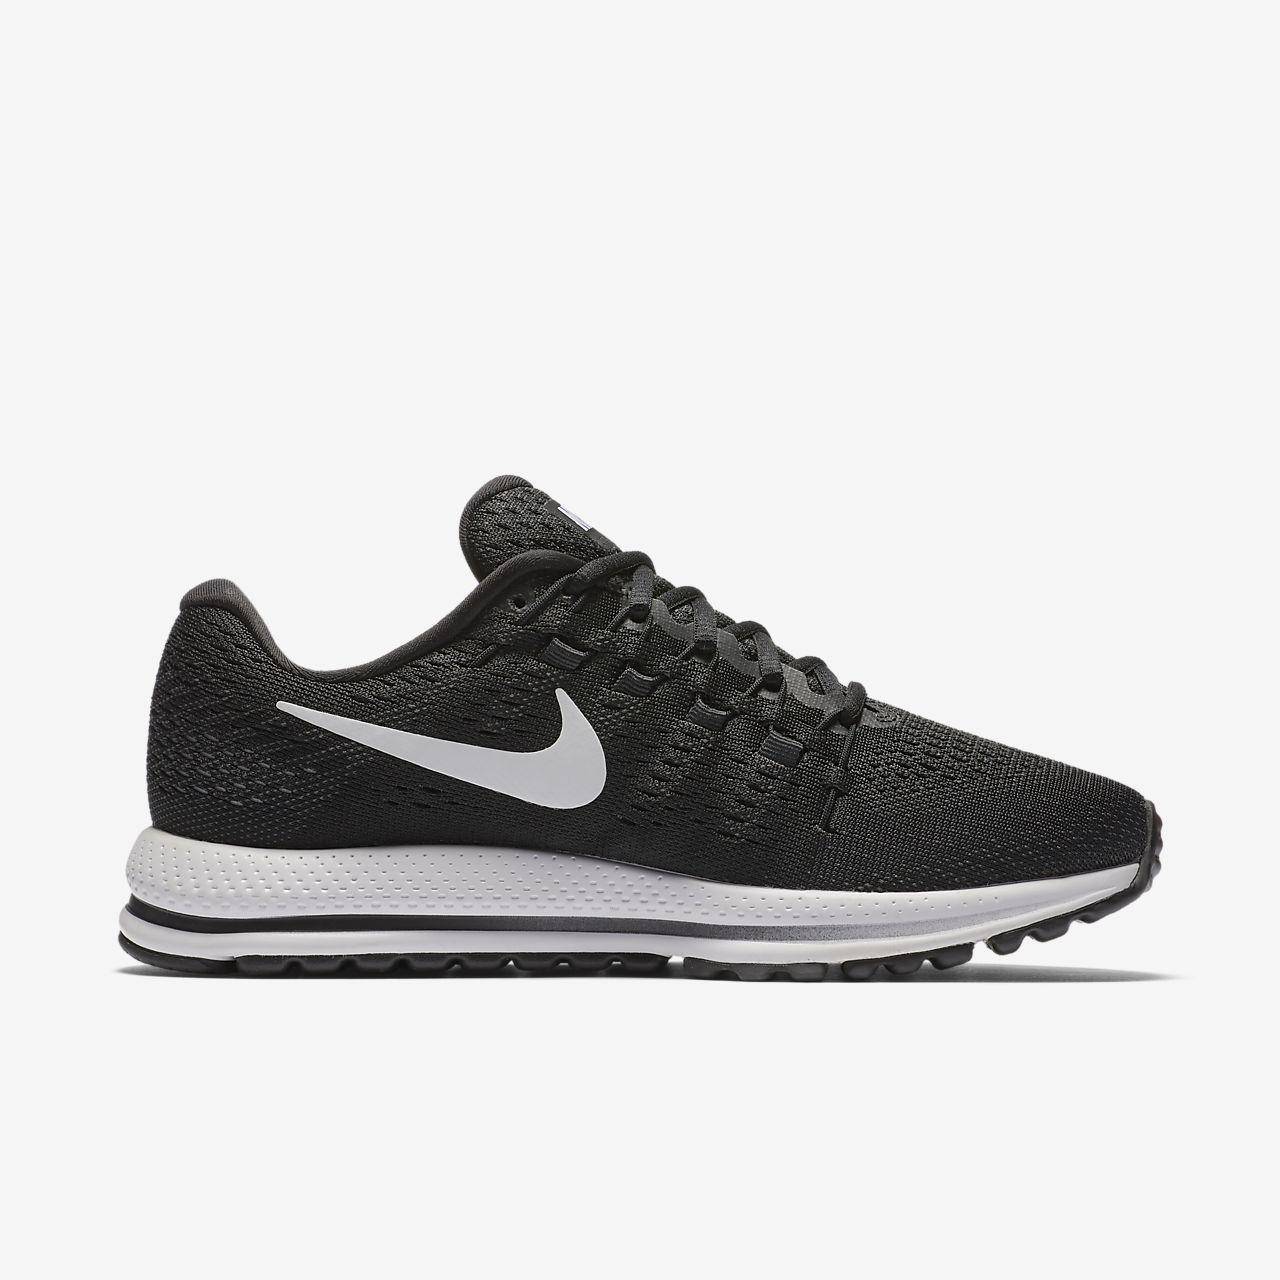 Nike Air Zoom Vomero Womens 7.5